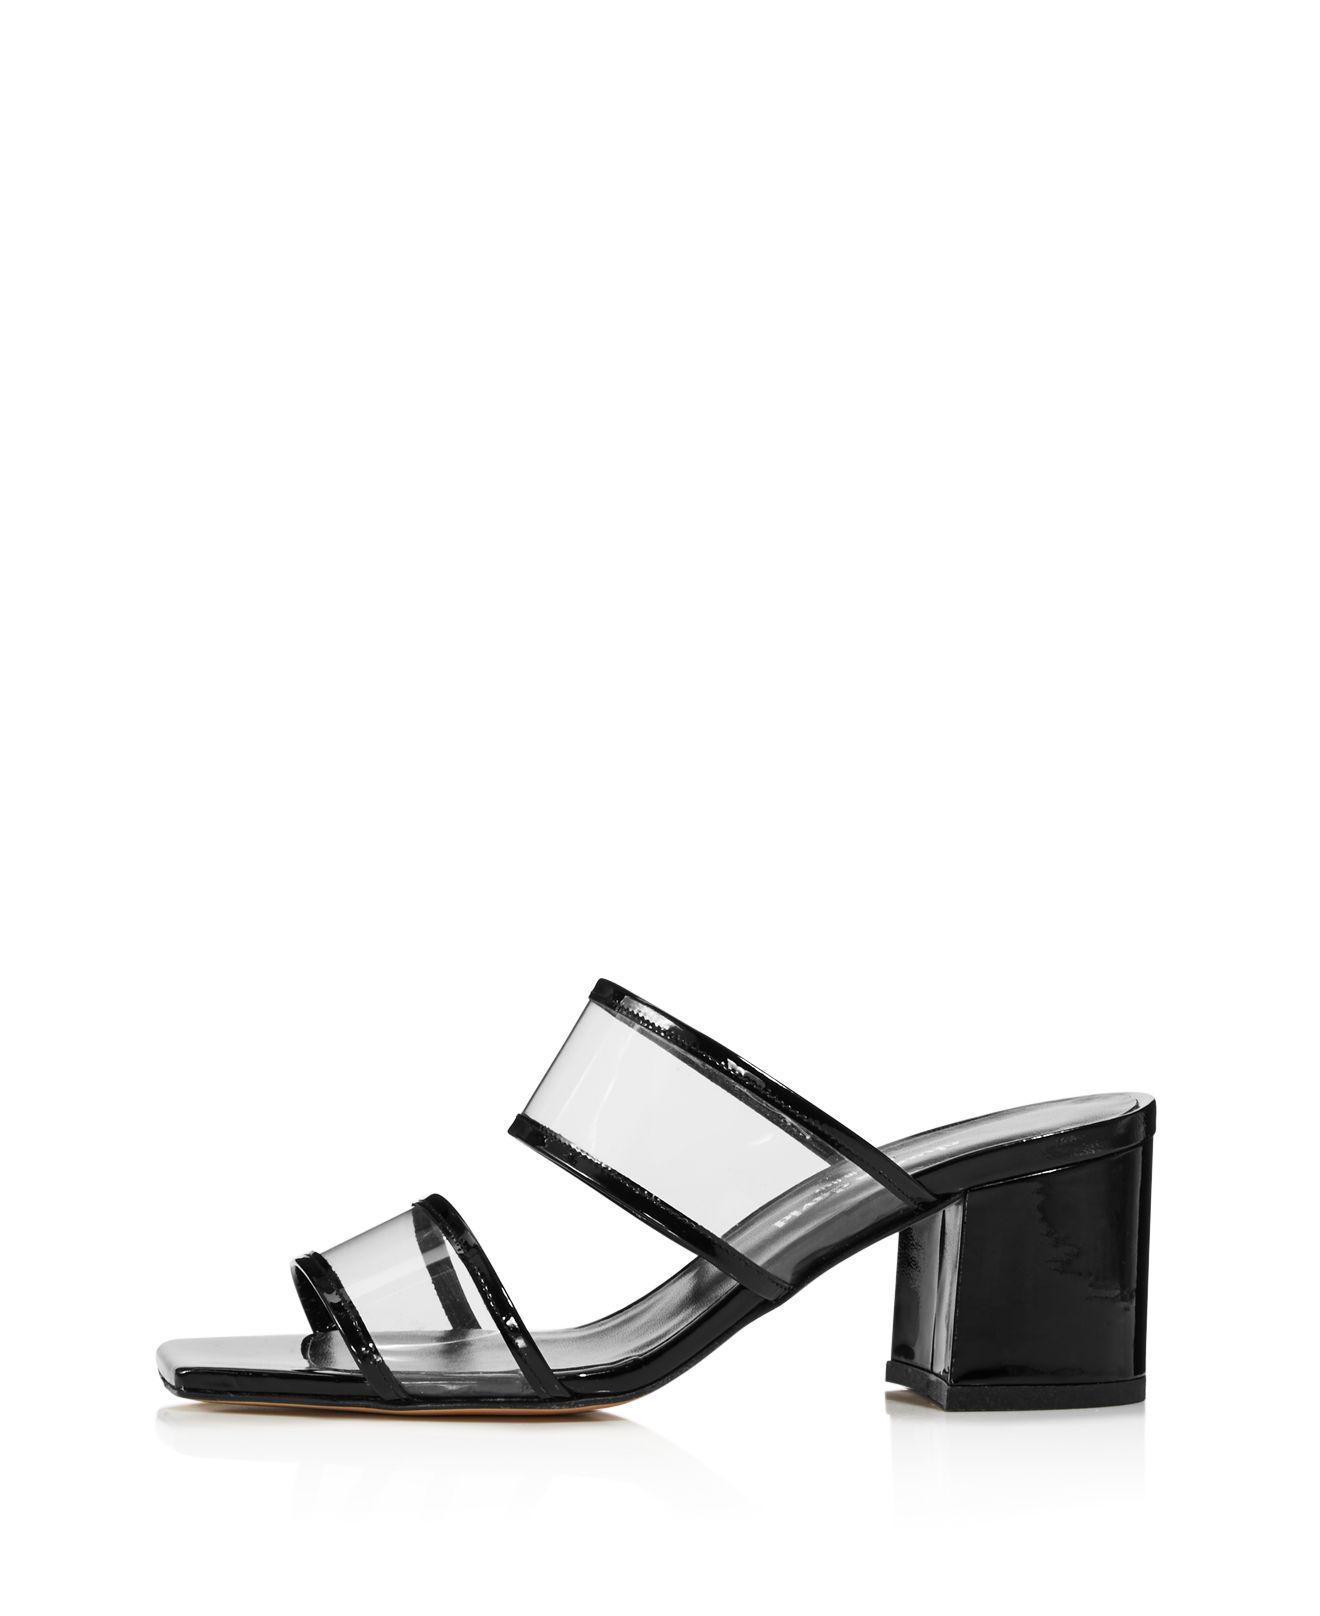 Charles David Women's Cally Leather Illusion Block Heel Slide Sandals fKJJf7sh4E